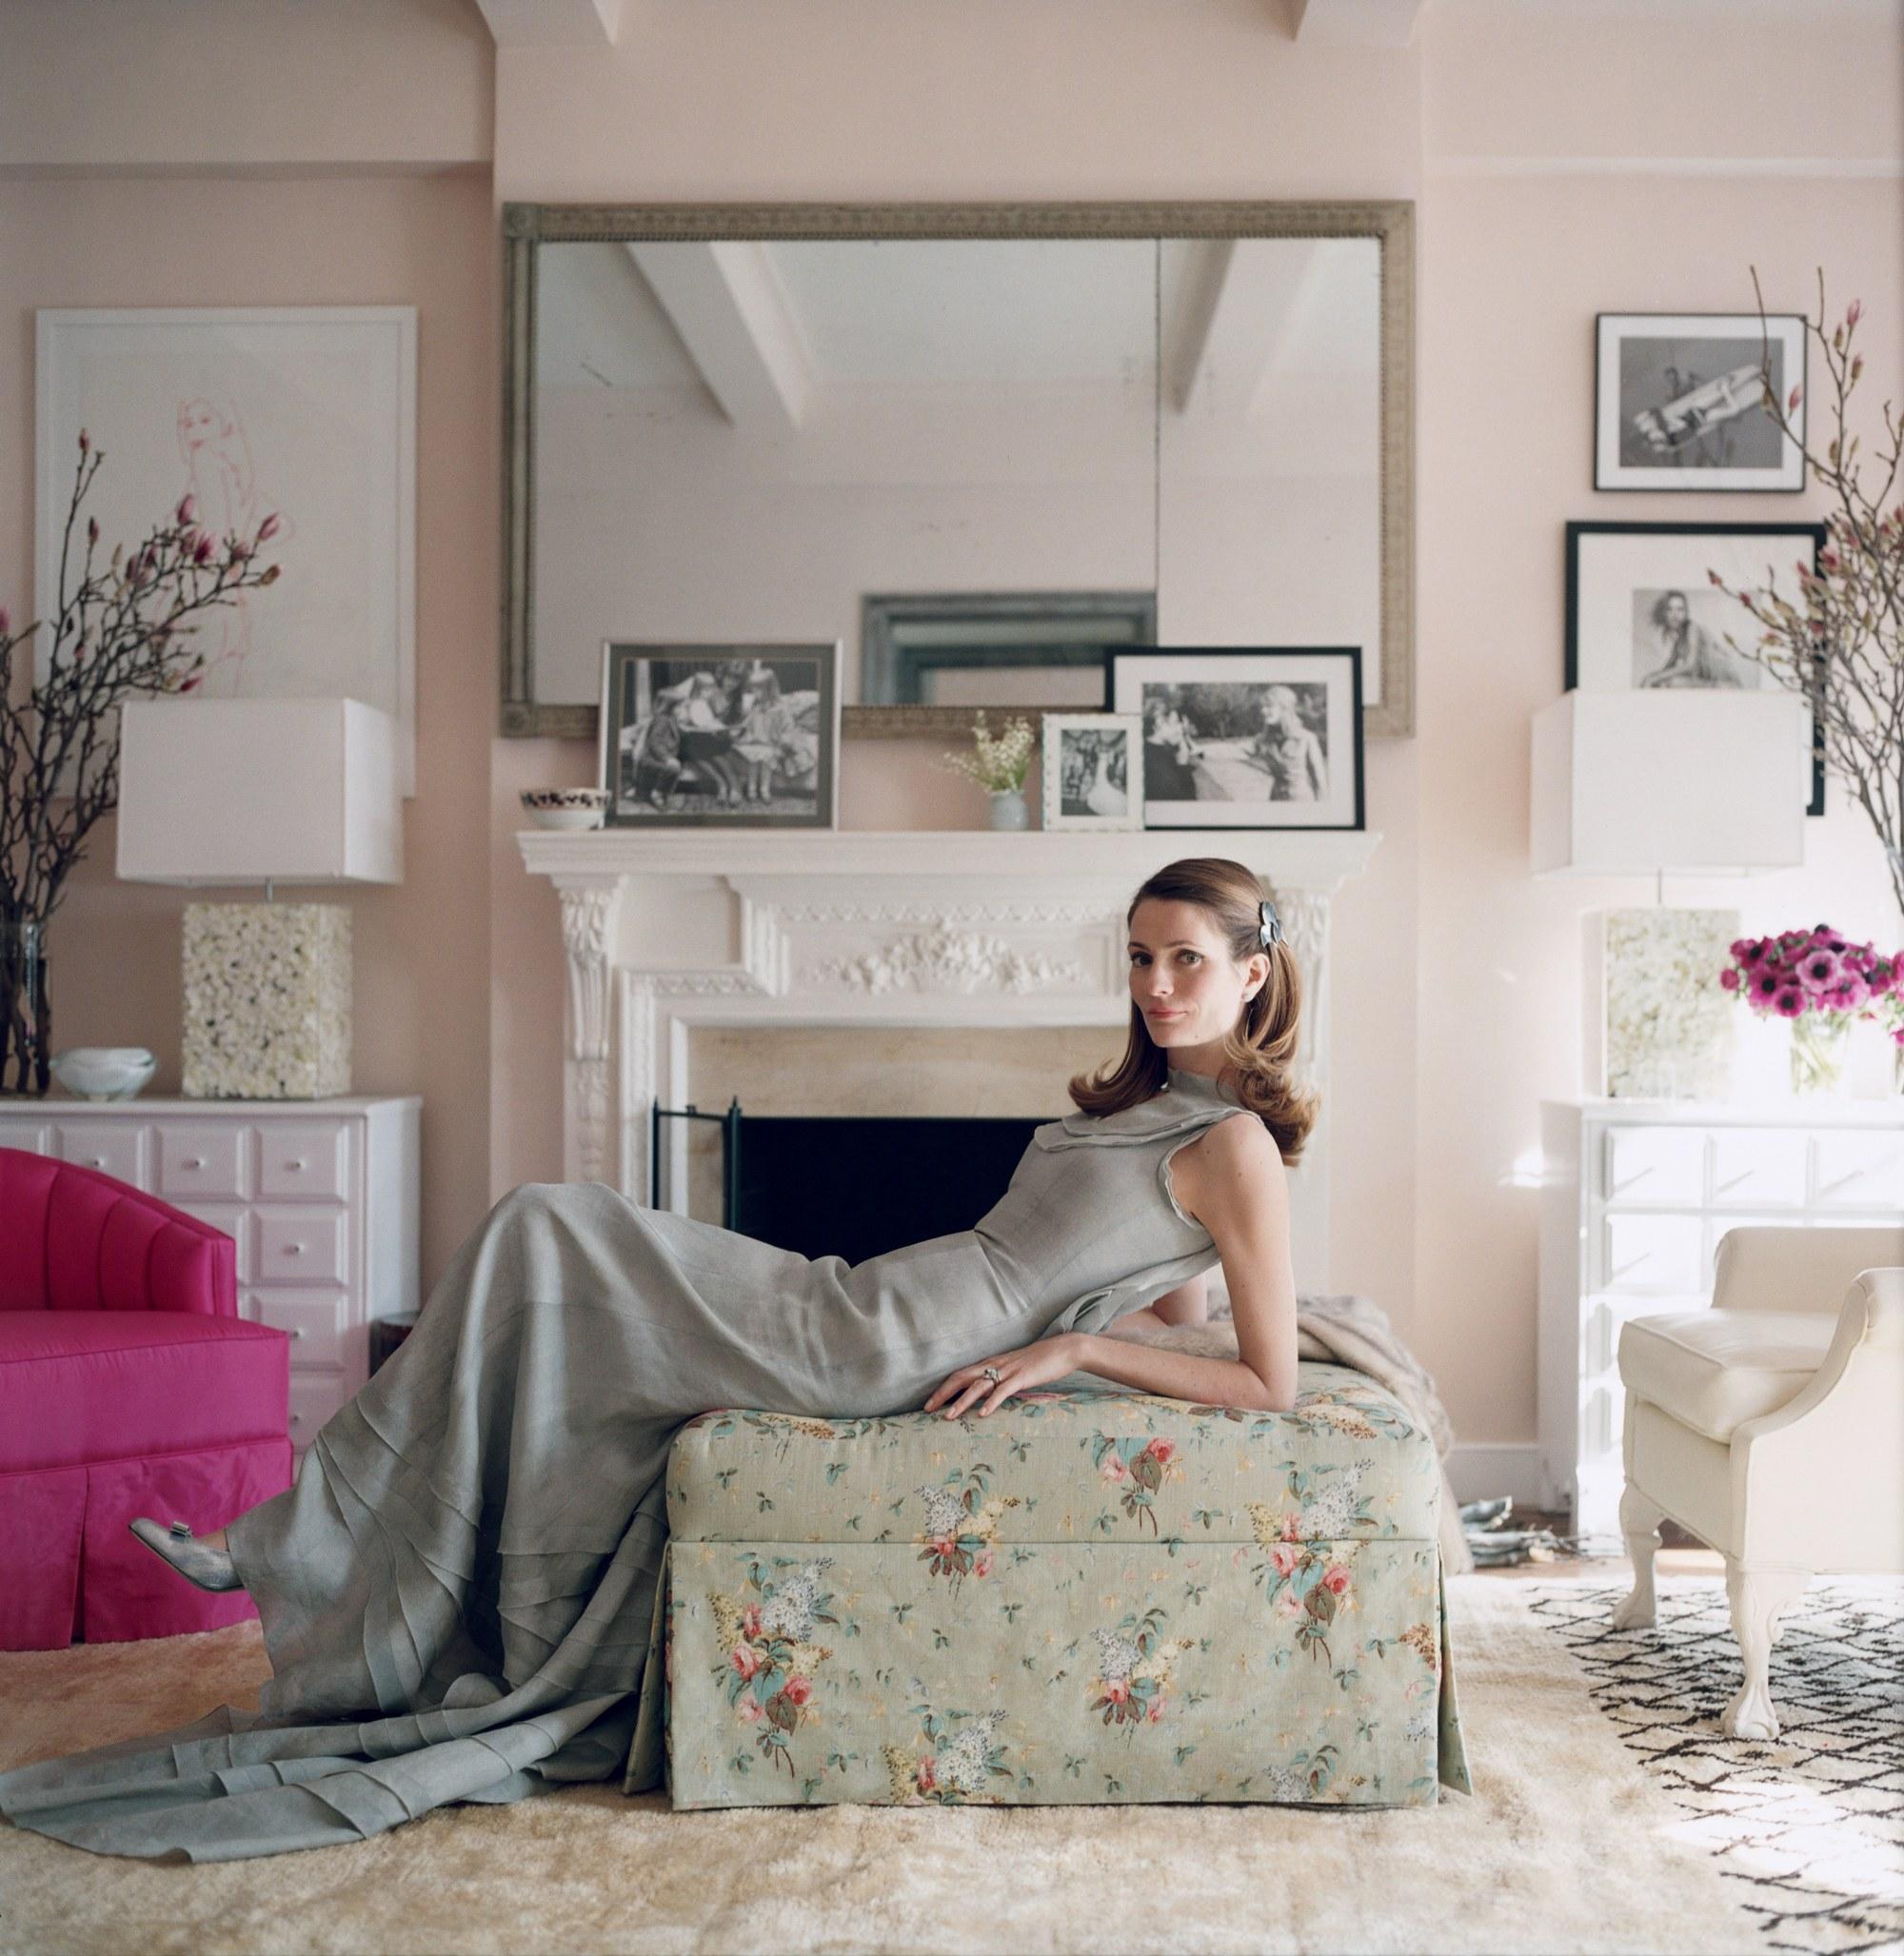 Pink Ground by Farrow & Ball; Image via Vogue Magazine